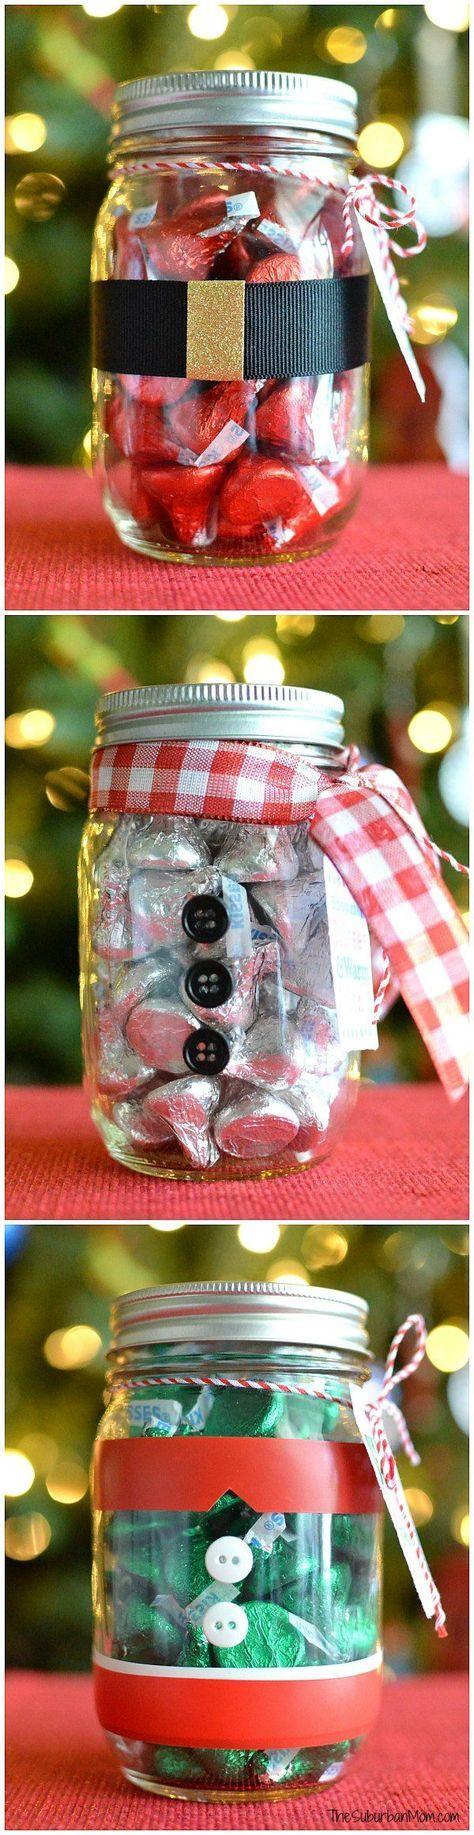 Mason Jar Christmas Gifts + Free Printable Tag | DIY | Pinterest ...